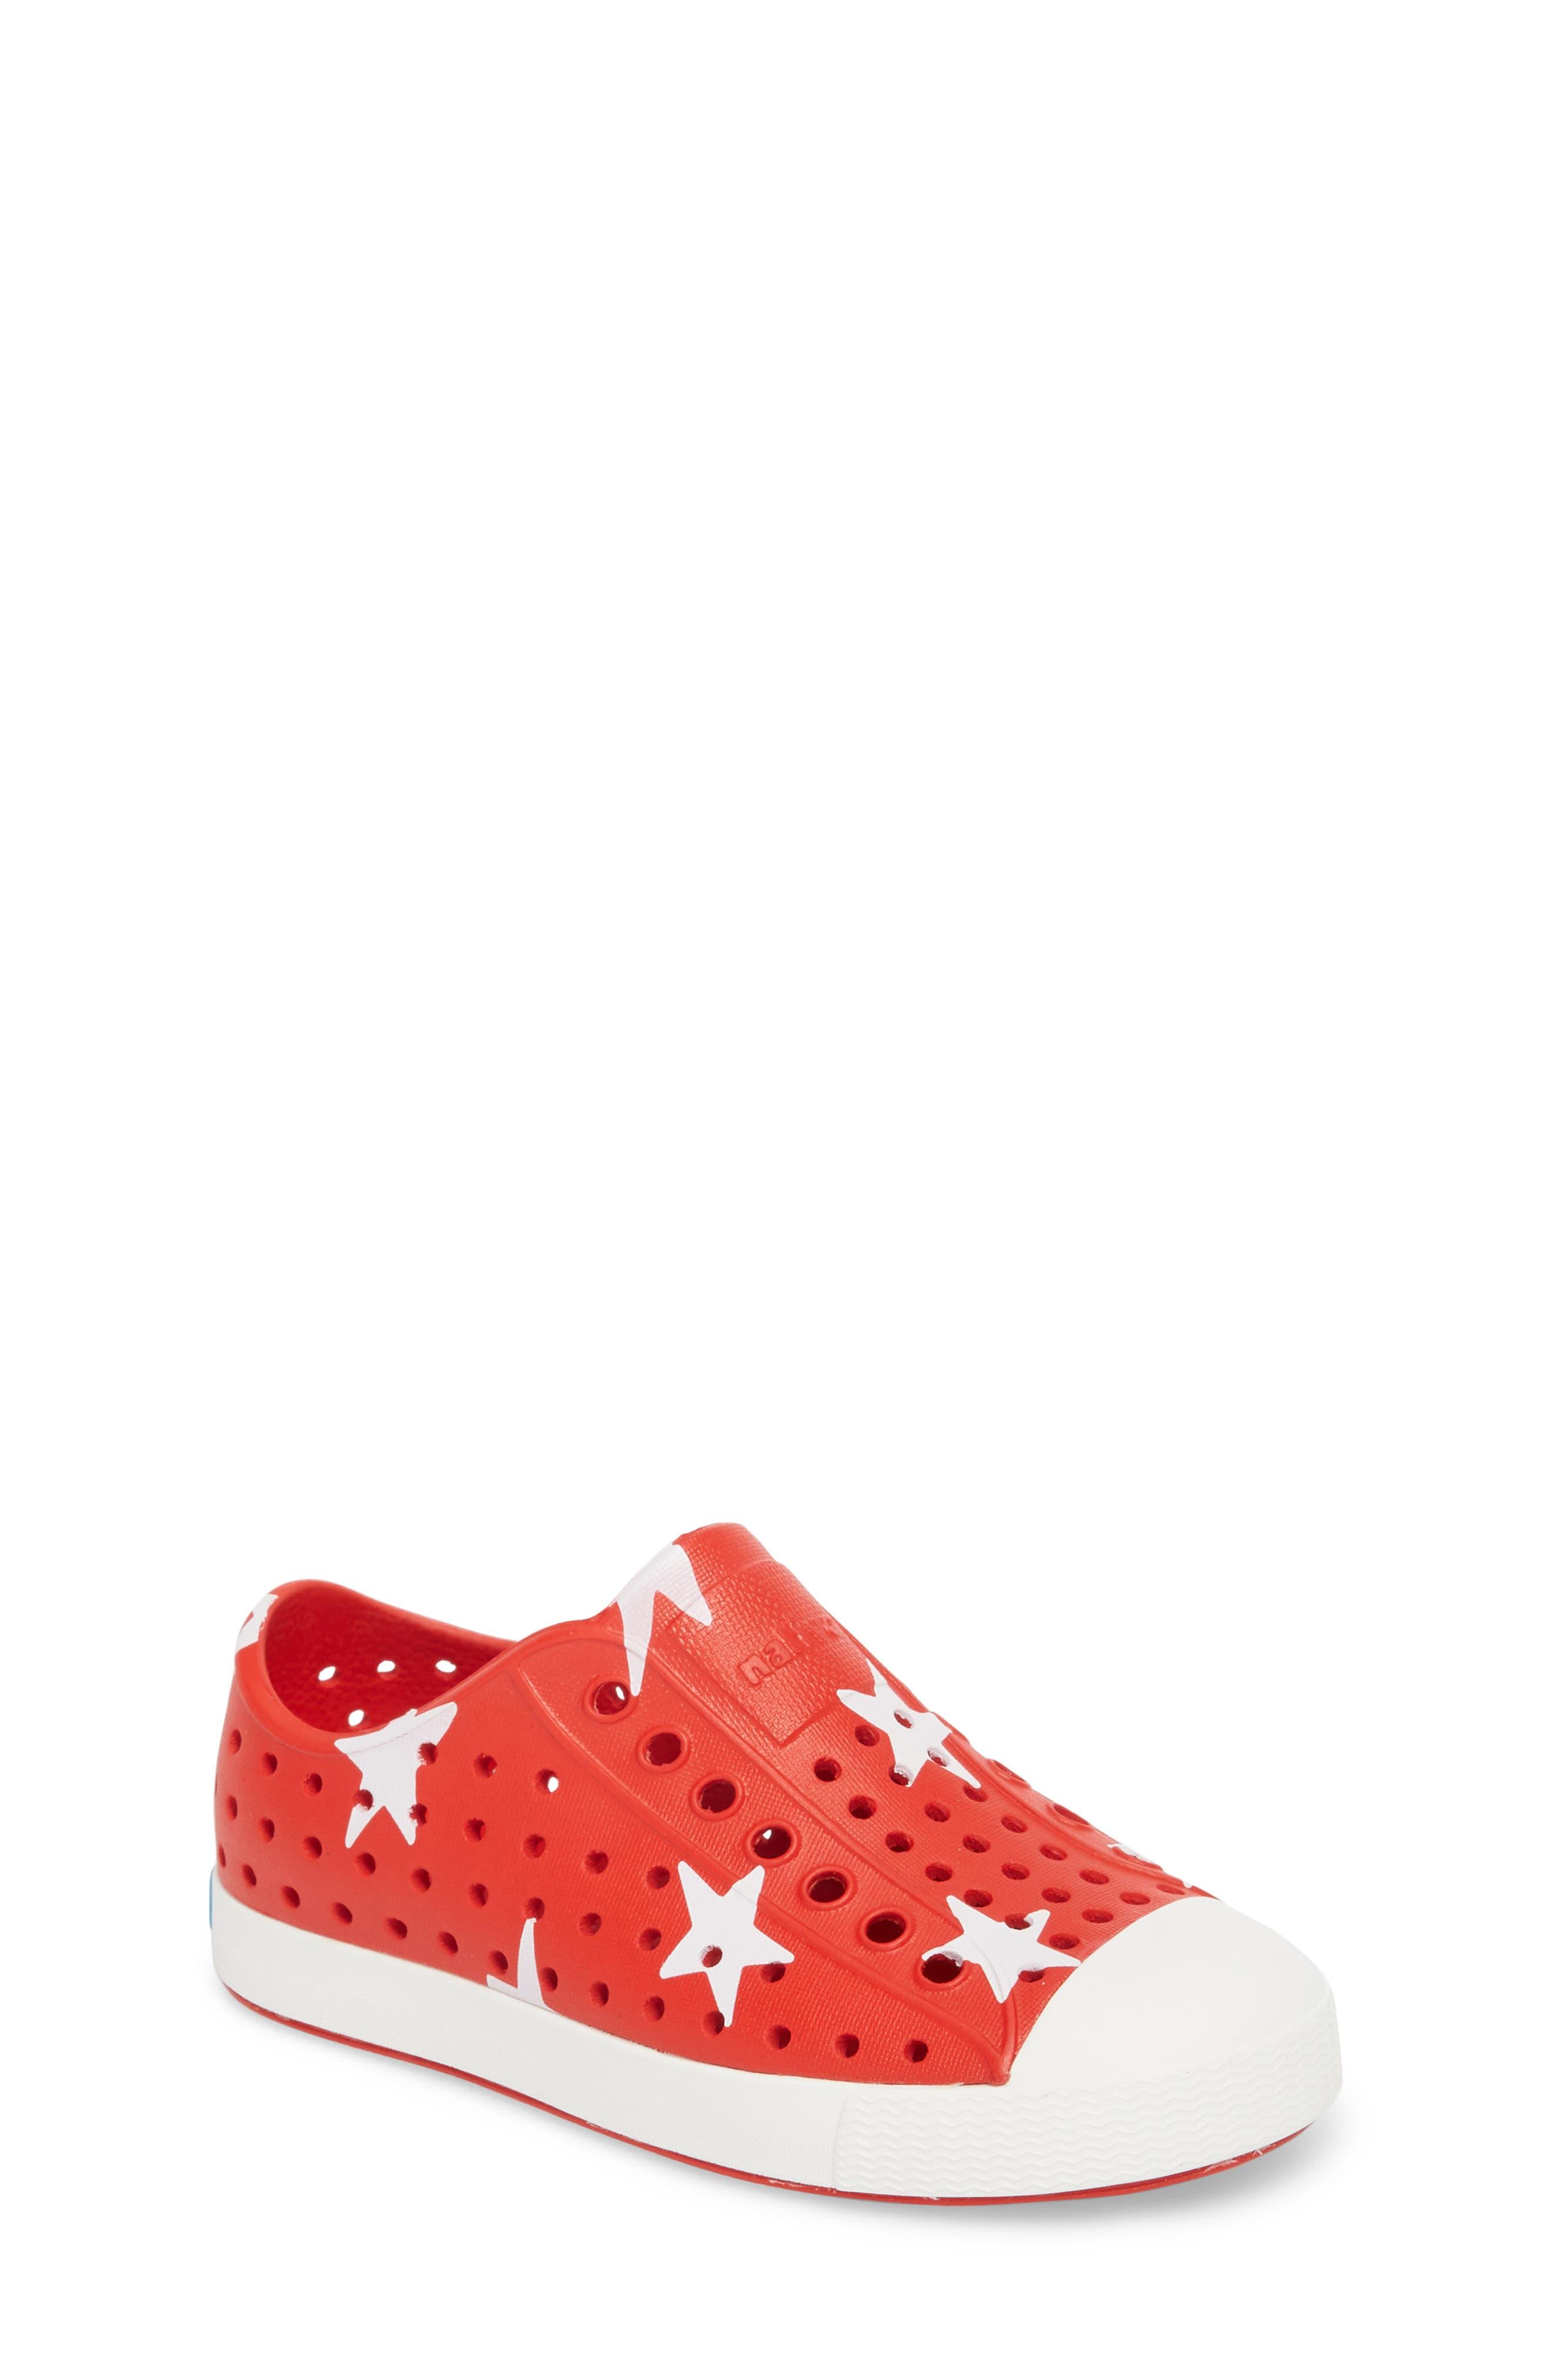 Jefferson Quartz Slip-On Sneaker,                         Main,                         color, TORCH RED/ BONE WHITE/ STAR